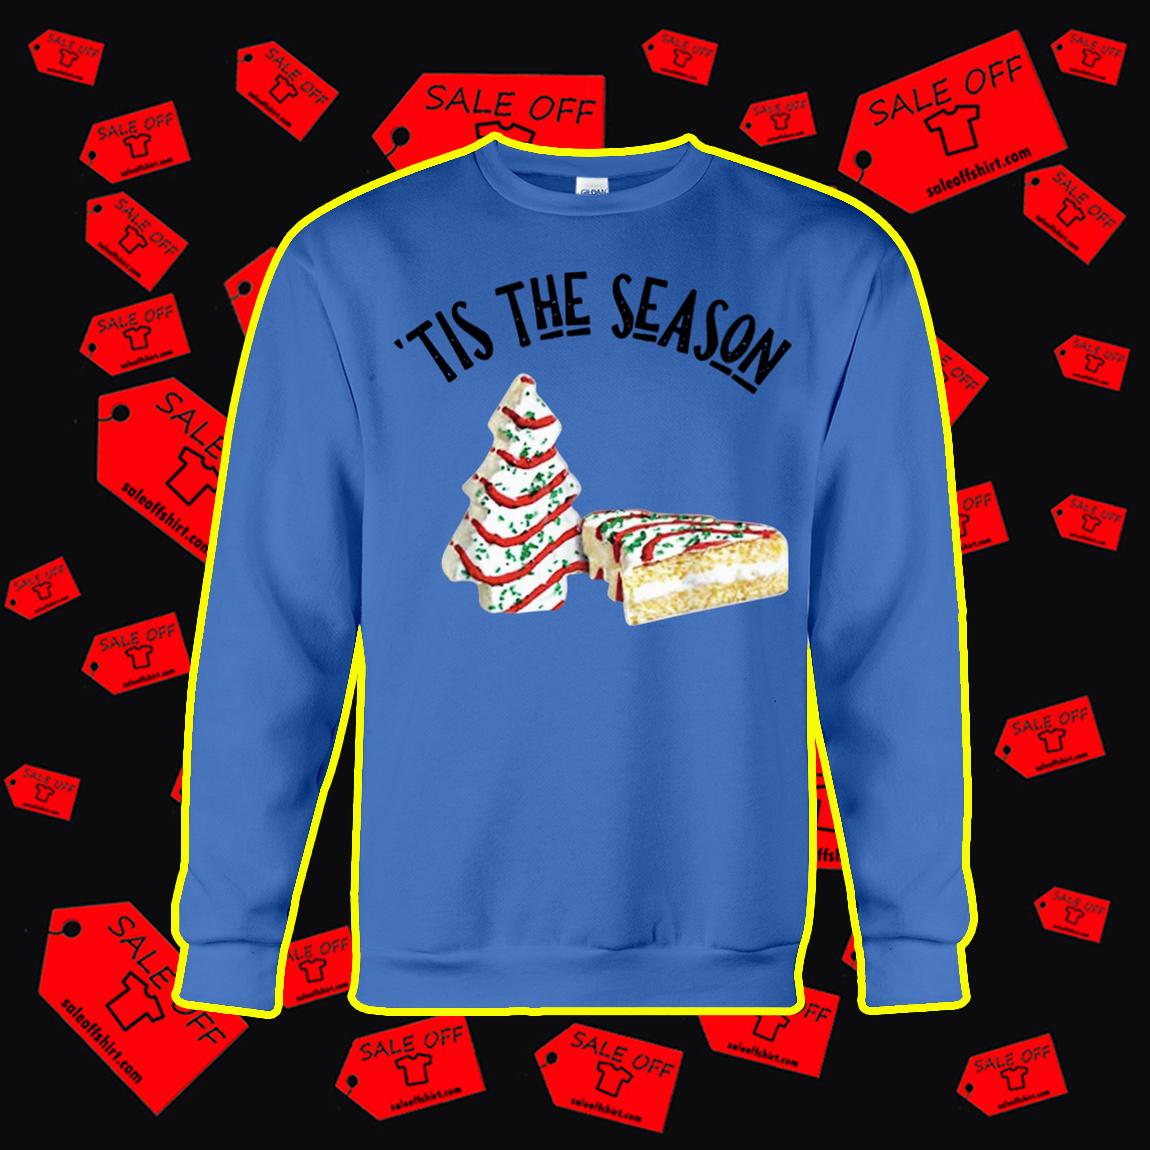 Christmas Tree Cakes Tis The Season sweatshirt